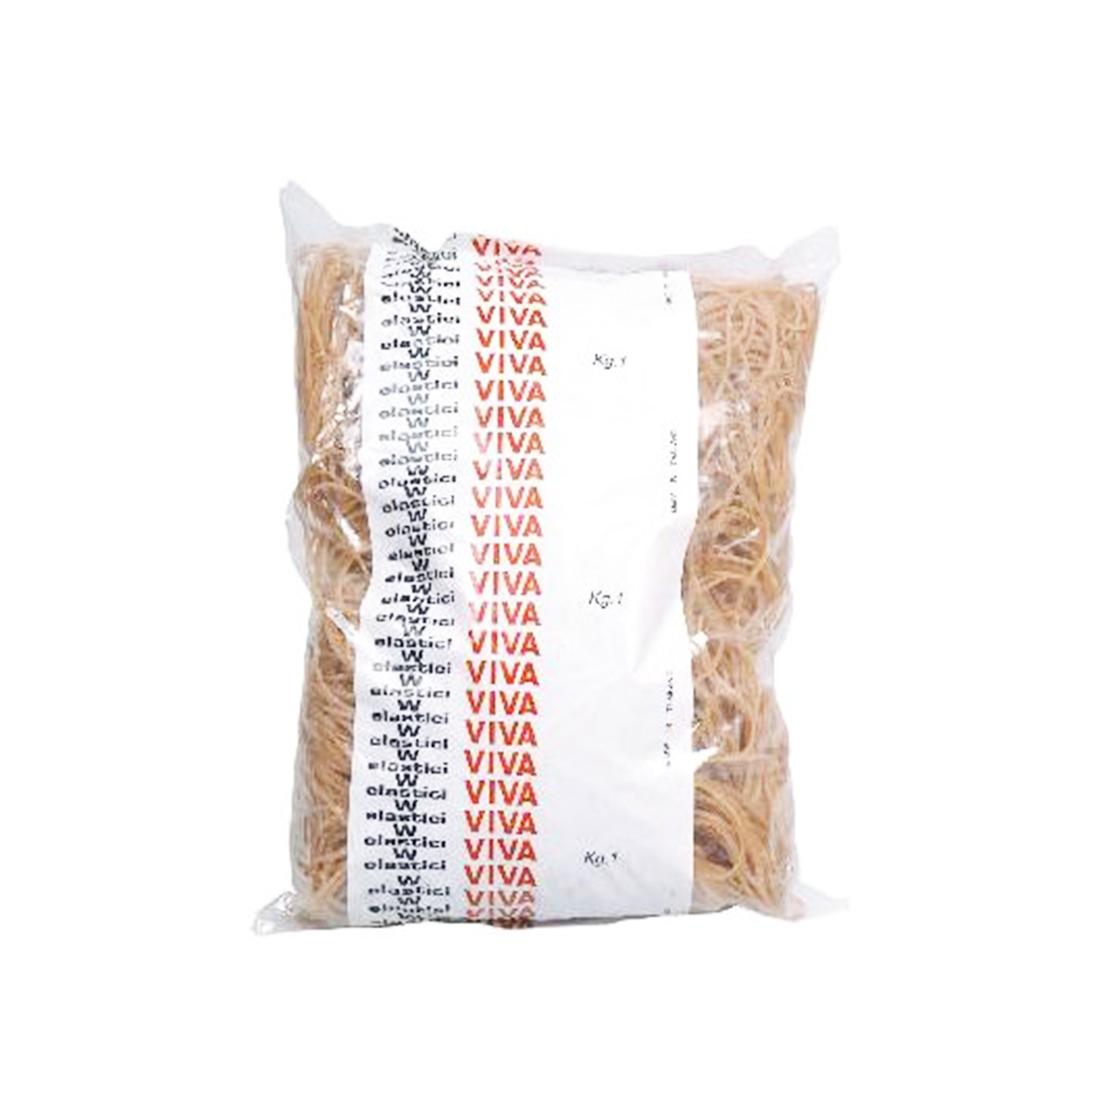 ELASTICI PARA IN BUSTA 150mm 1kg